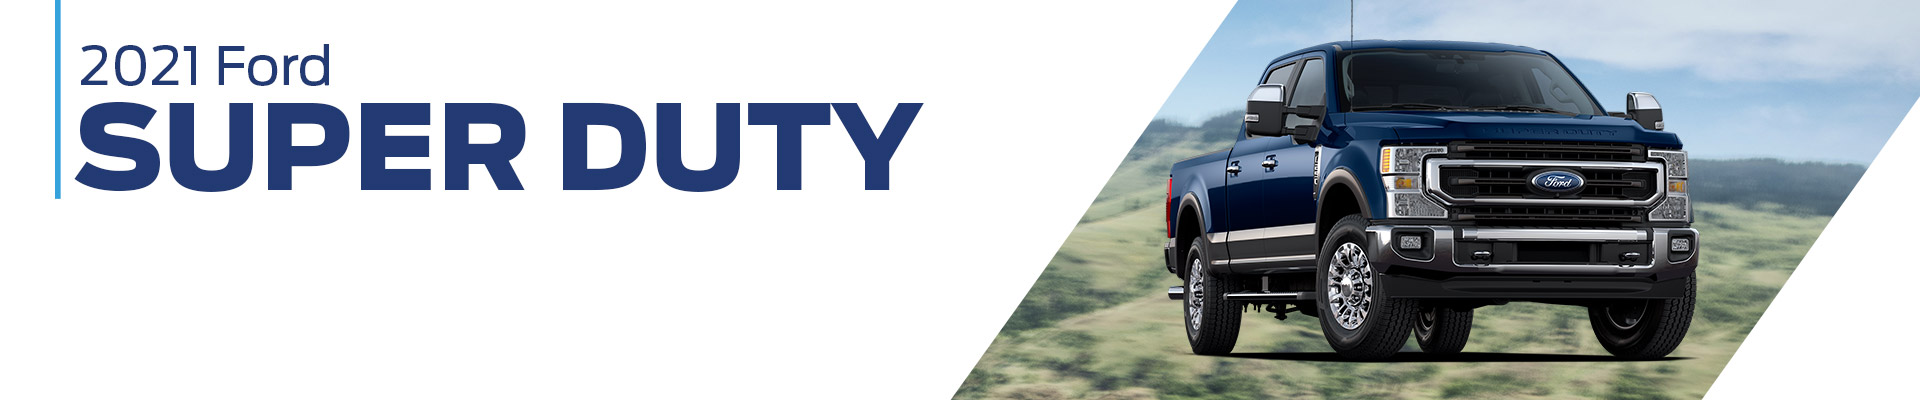 2021 Ford Super Duty - Sun State Ford - Orlando, FL